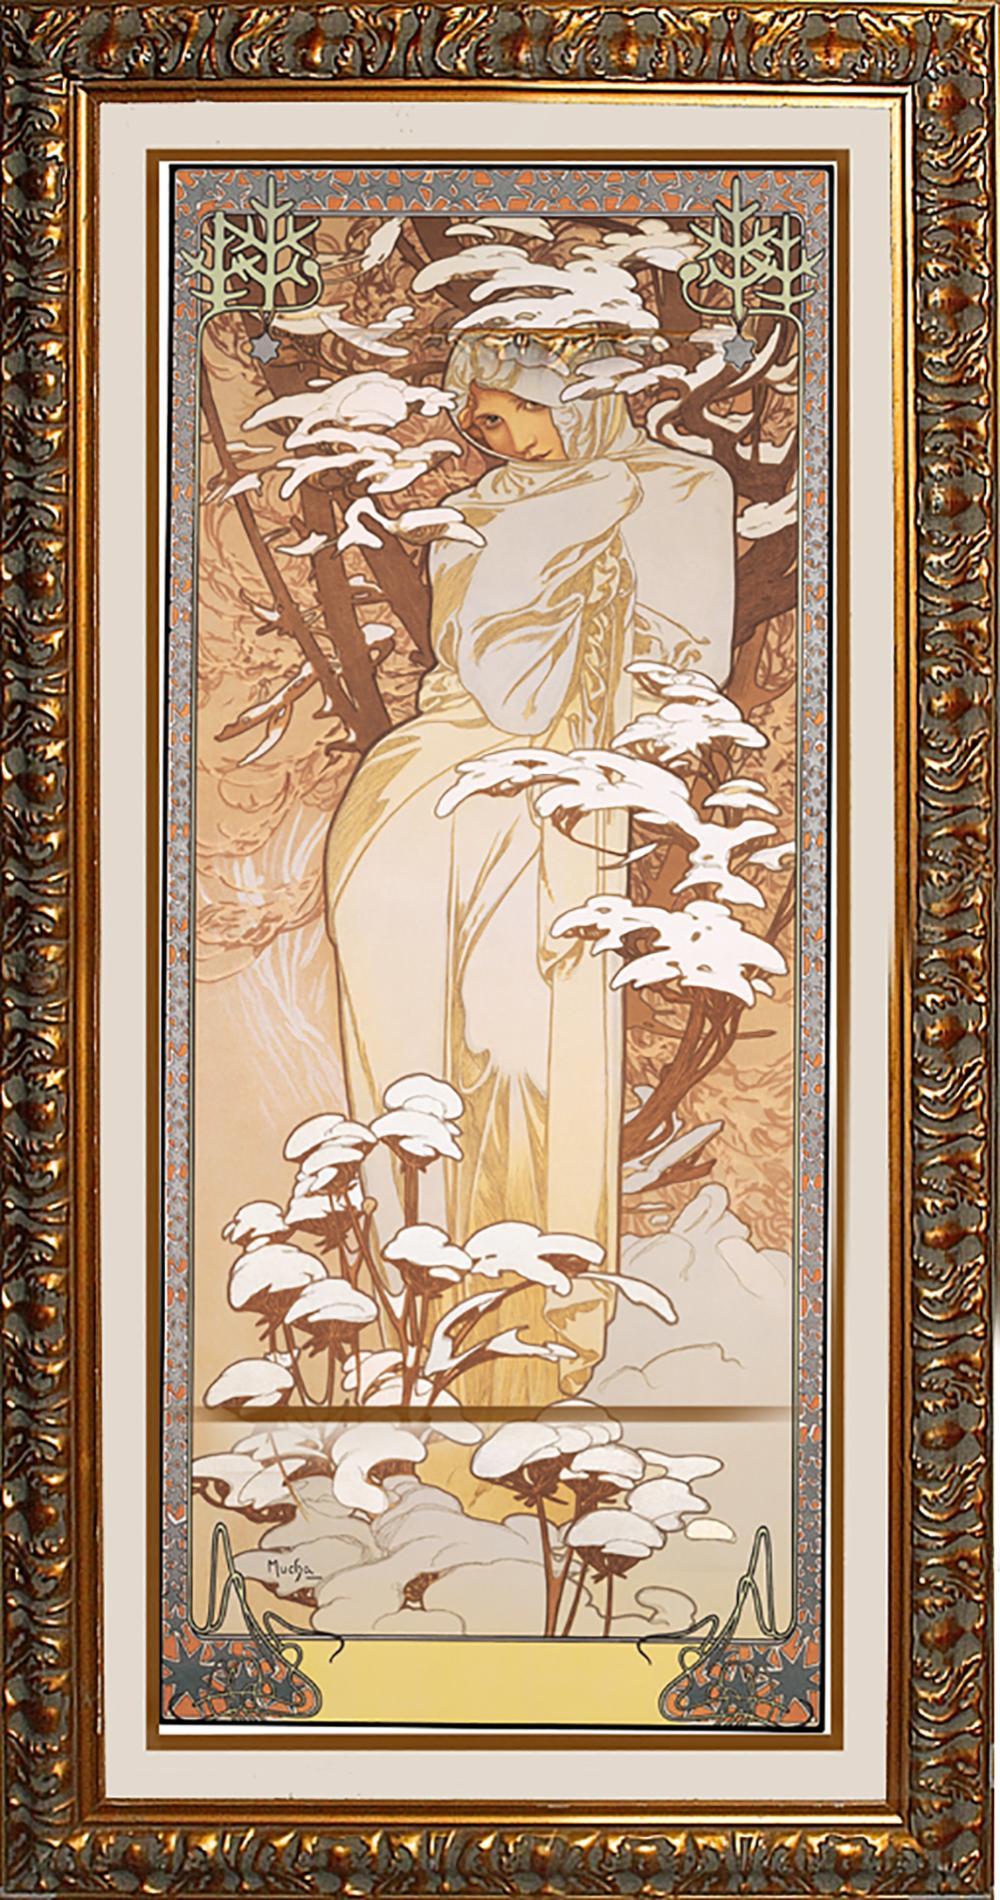 Lot 3426: Winter After Alphonse Mucha